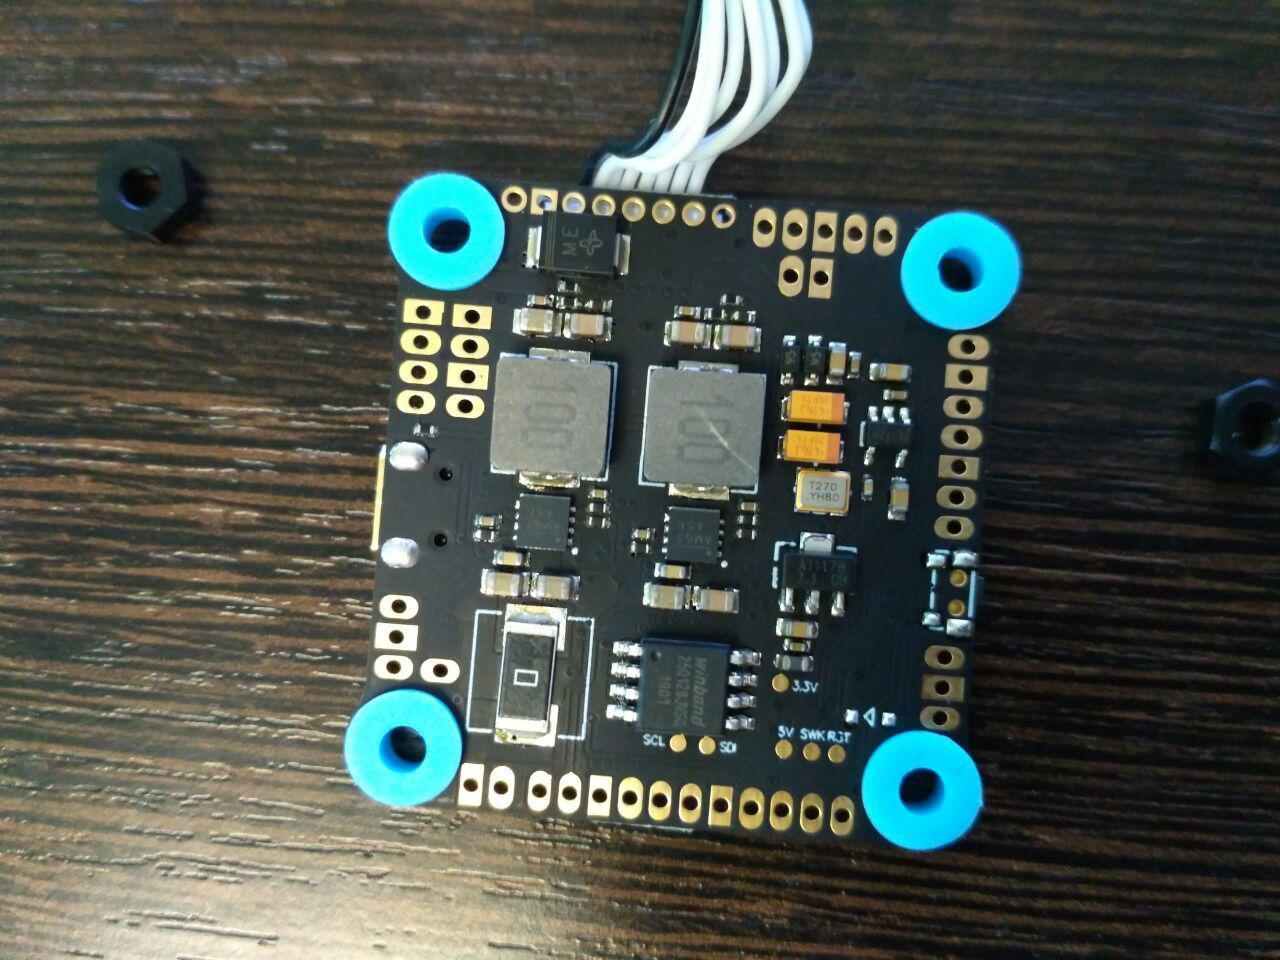 MAMBA F405 MK2 и MAMBA F405 mini MK2: обзор на полетные контроллеры